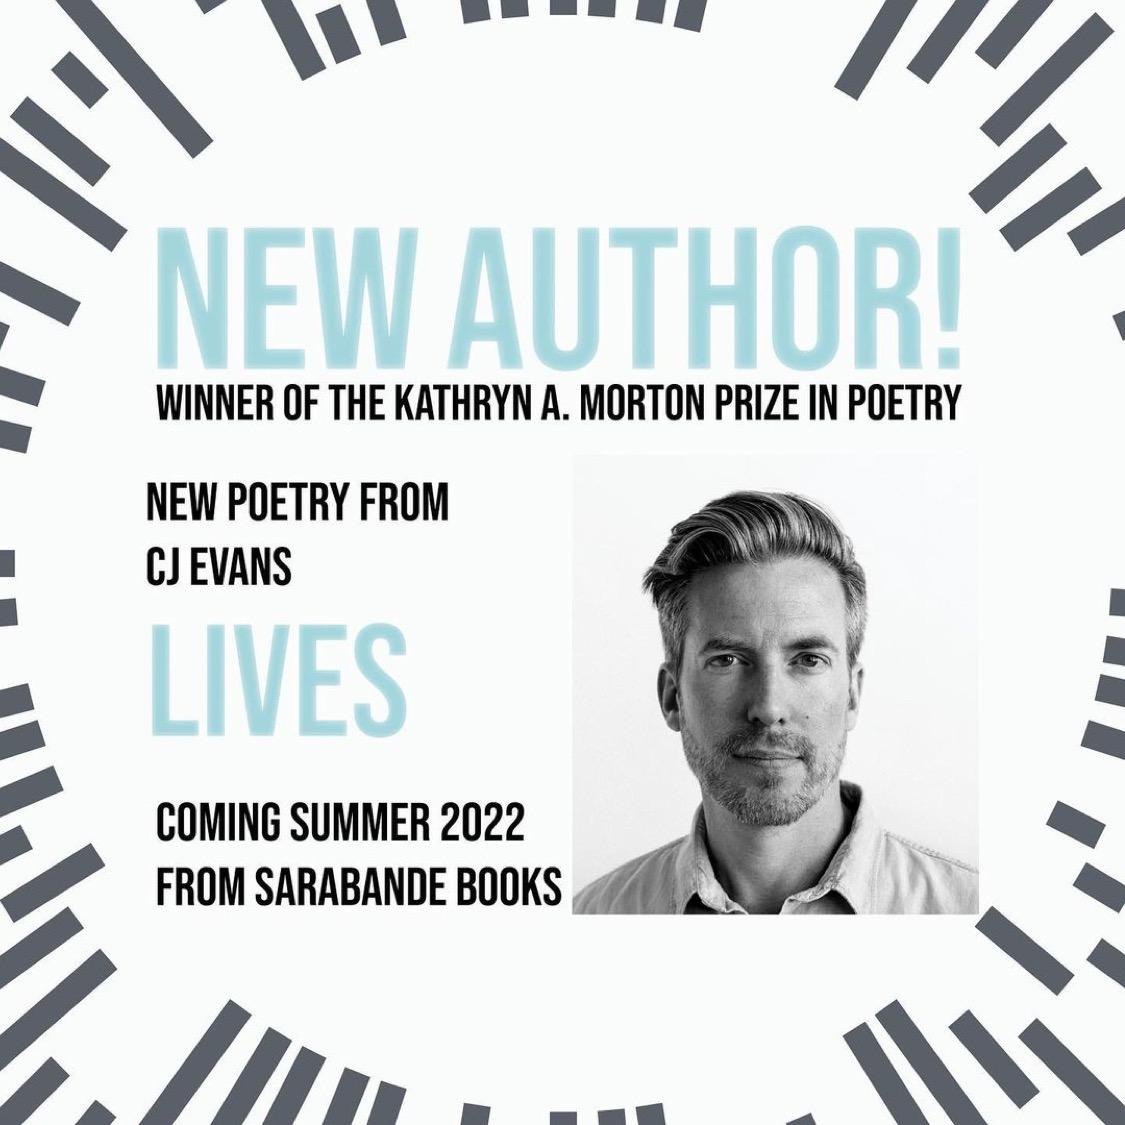 CJ Evans Wins Kathryn A Morton Prize from Sarabande Books